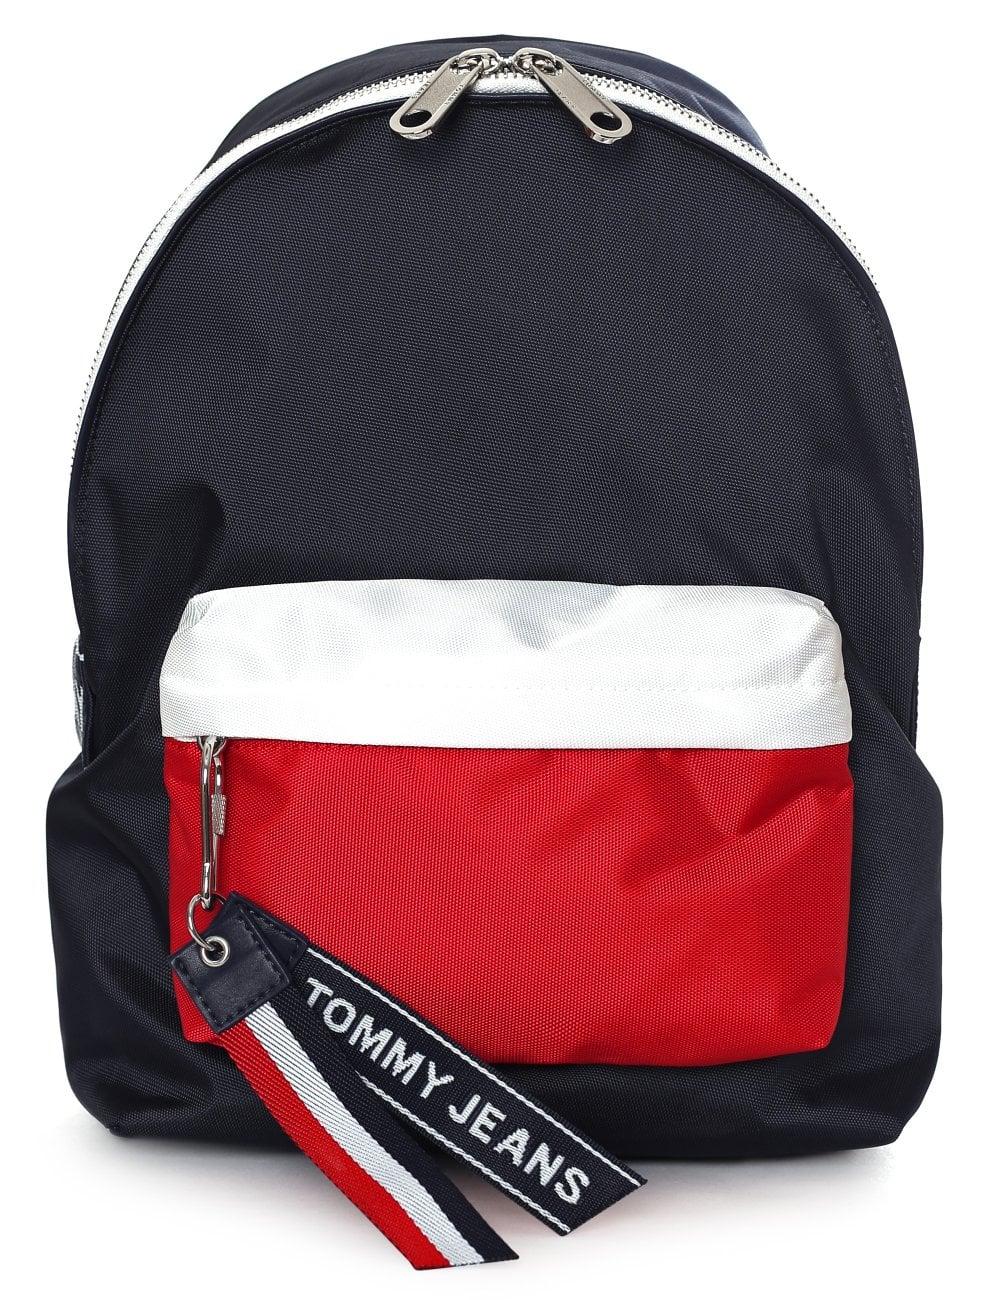 3d6625cd Tommy Hilfiger Women's Tommy Jeans Logo Mini Backpack